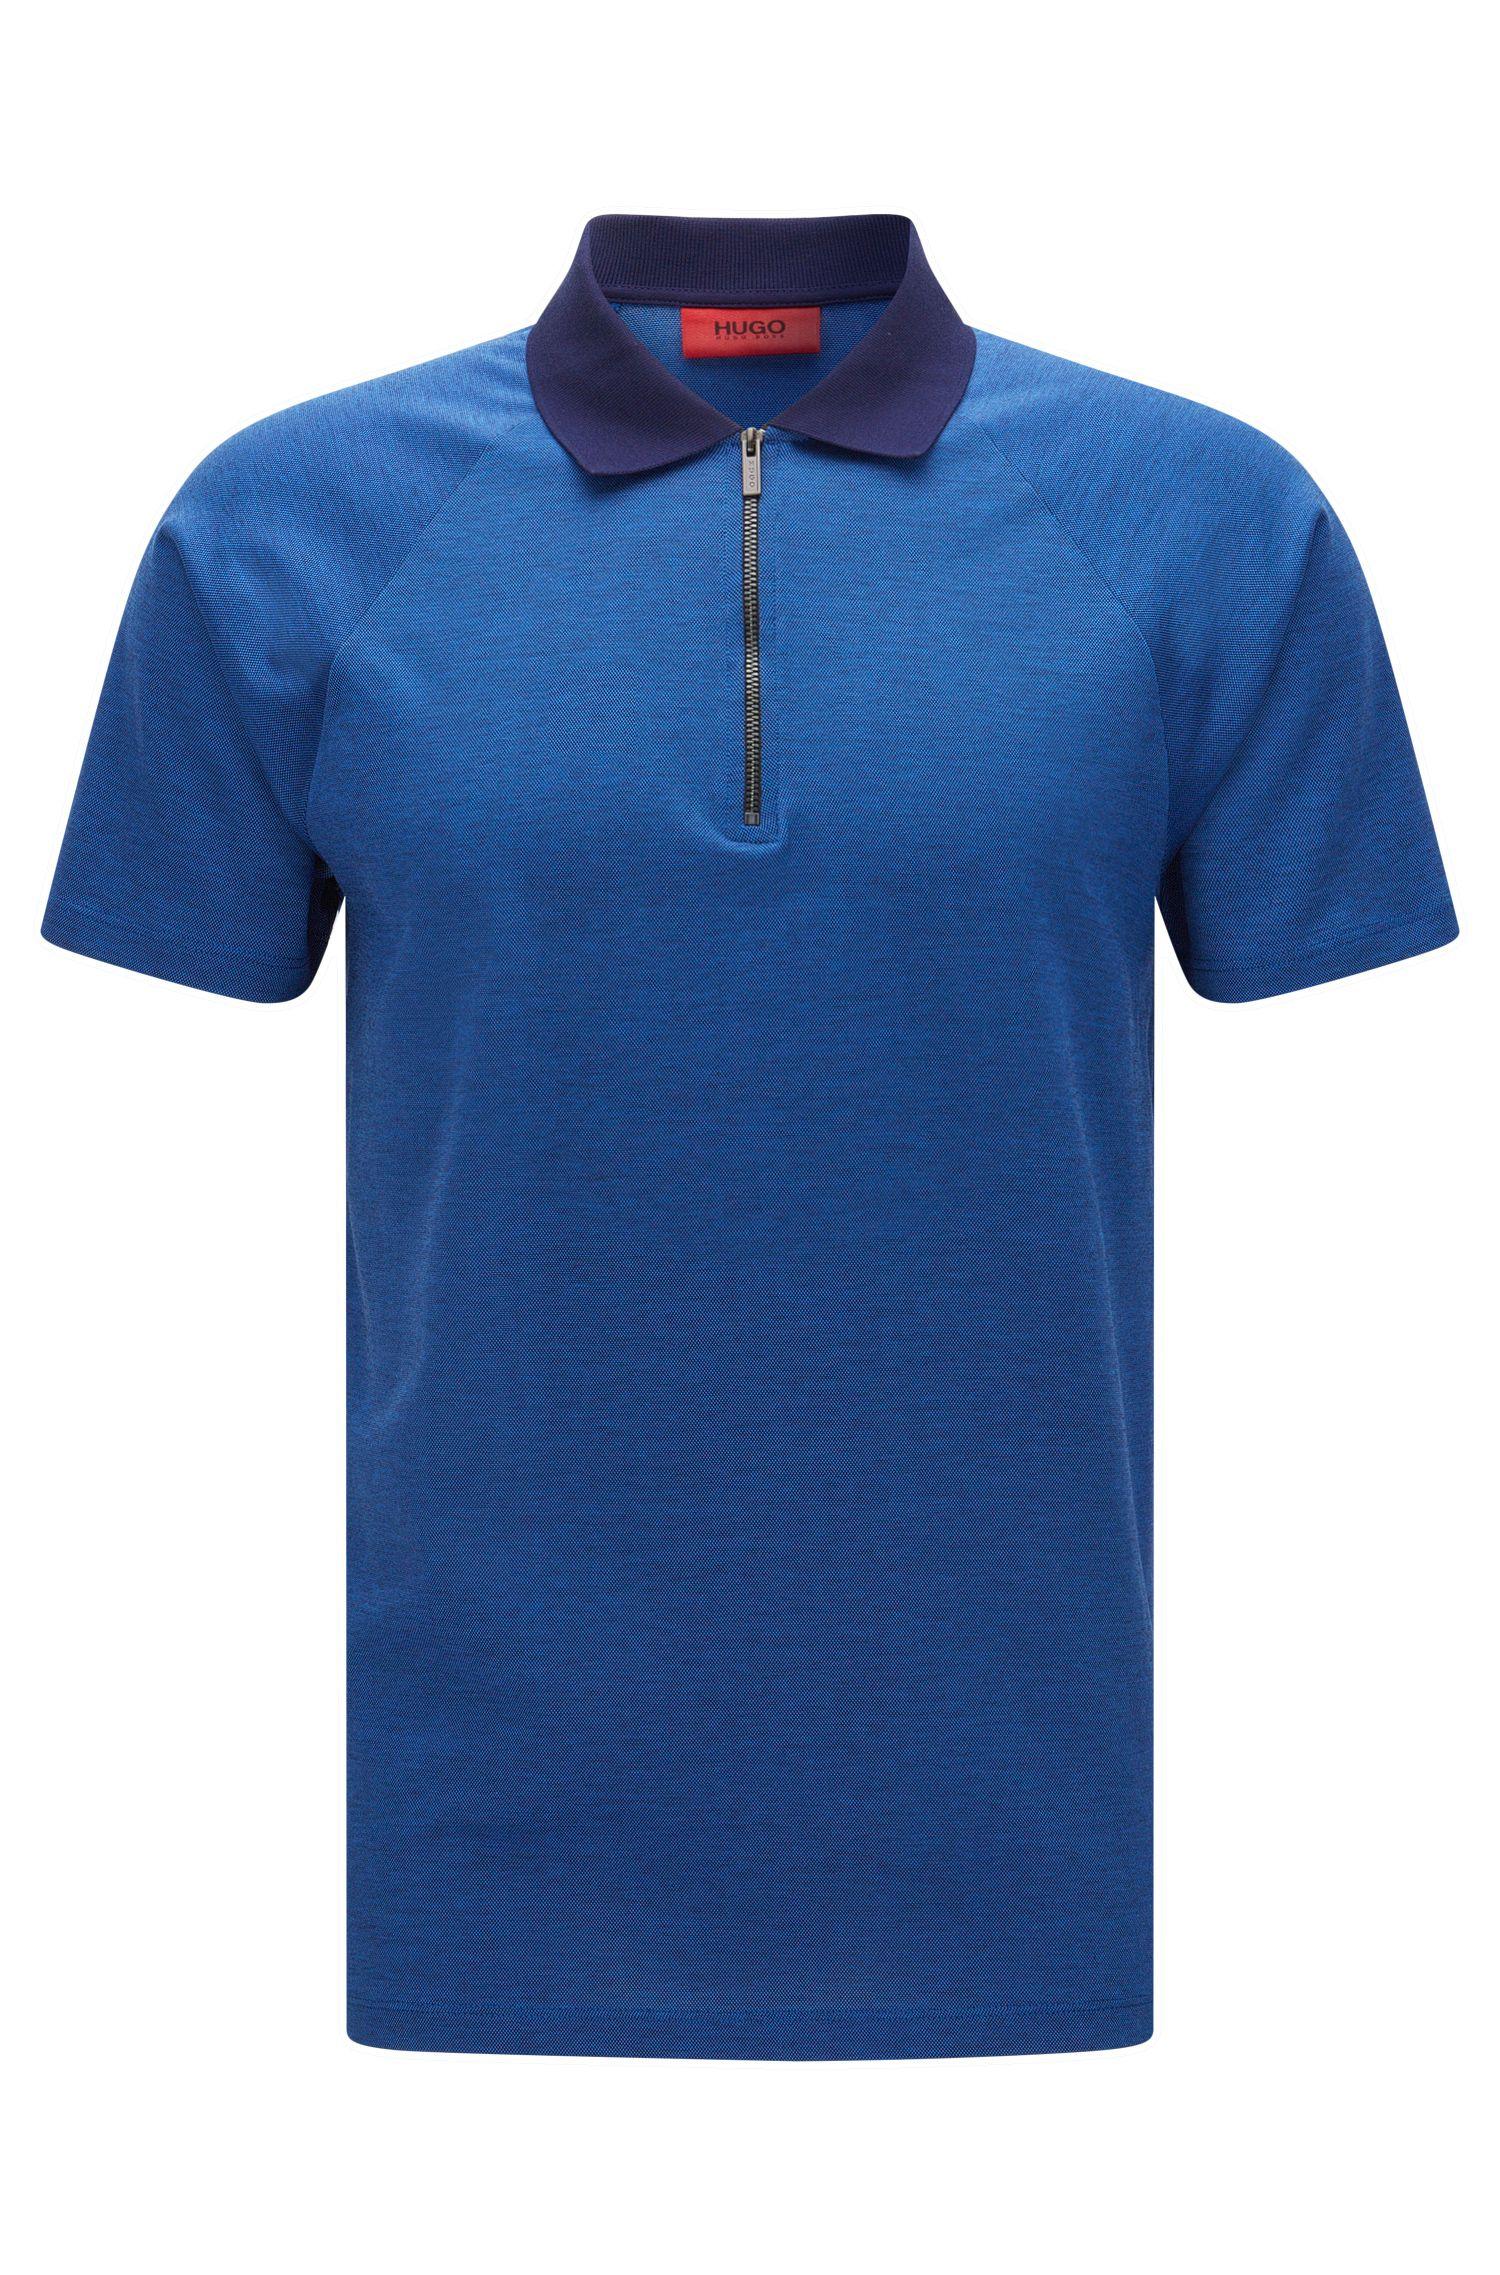 'Dericsson'   Slim Fit, Cotton Textured Polo